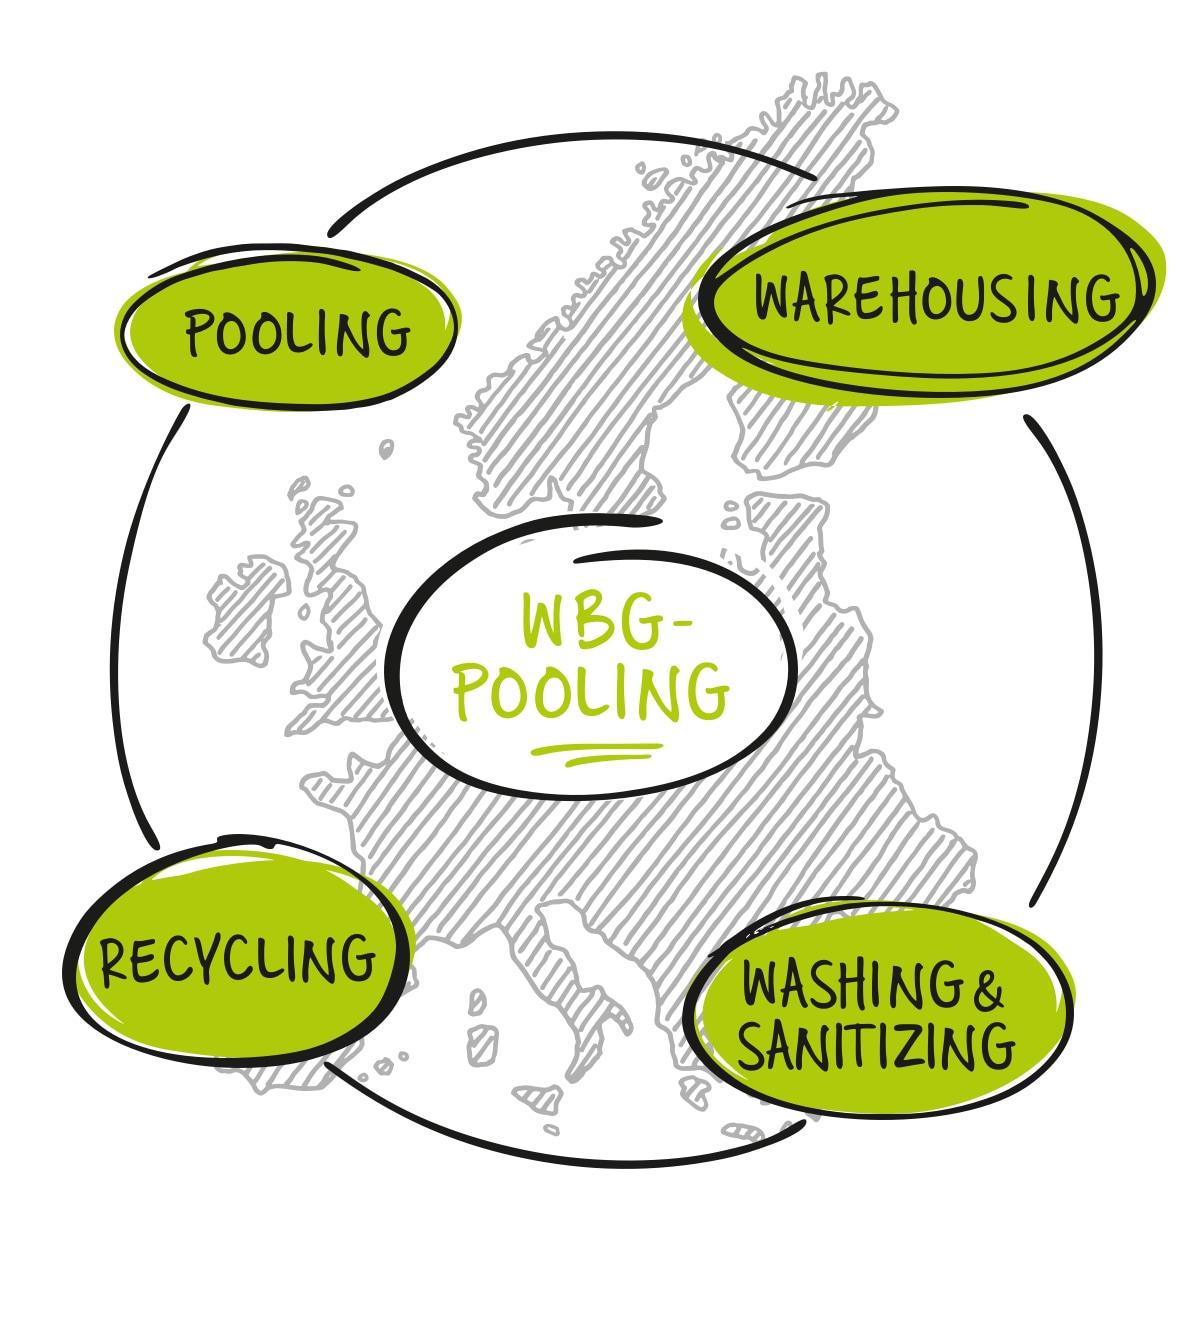 Bestandteile eines effizienten Ladungsträgermanagement: Warehousing, Washing & Sanitizing, Recycling & Pooling